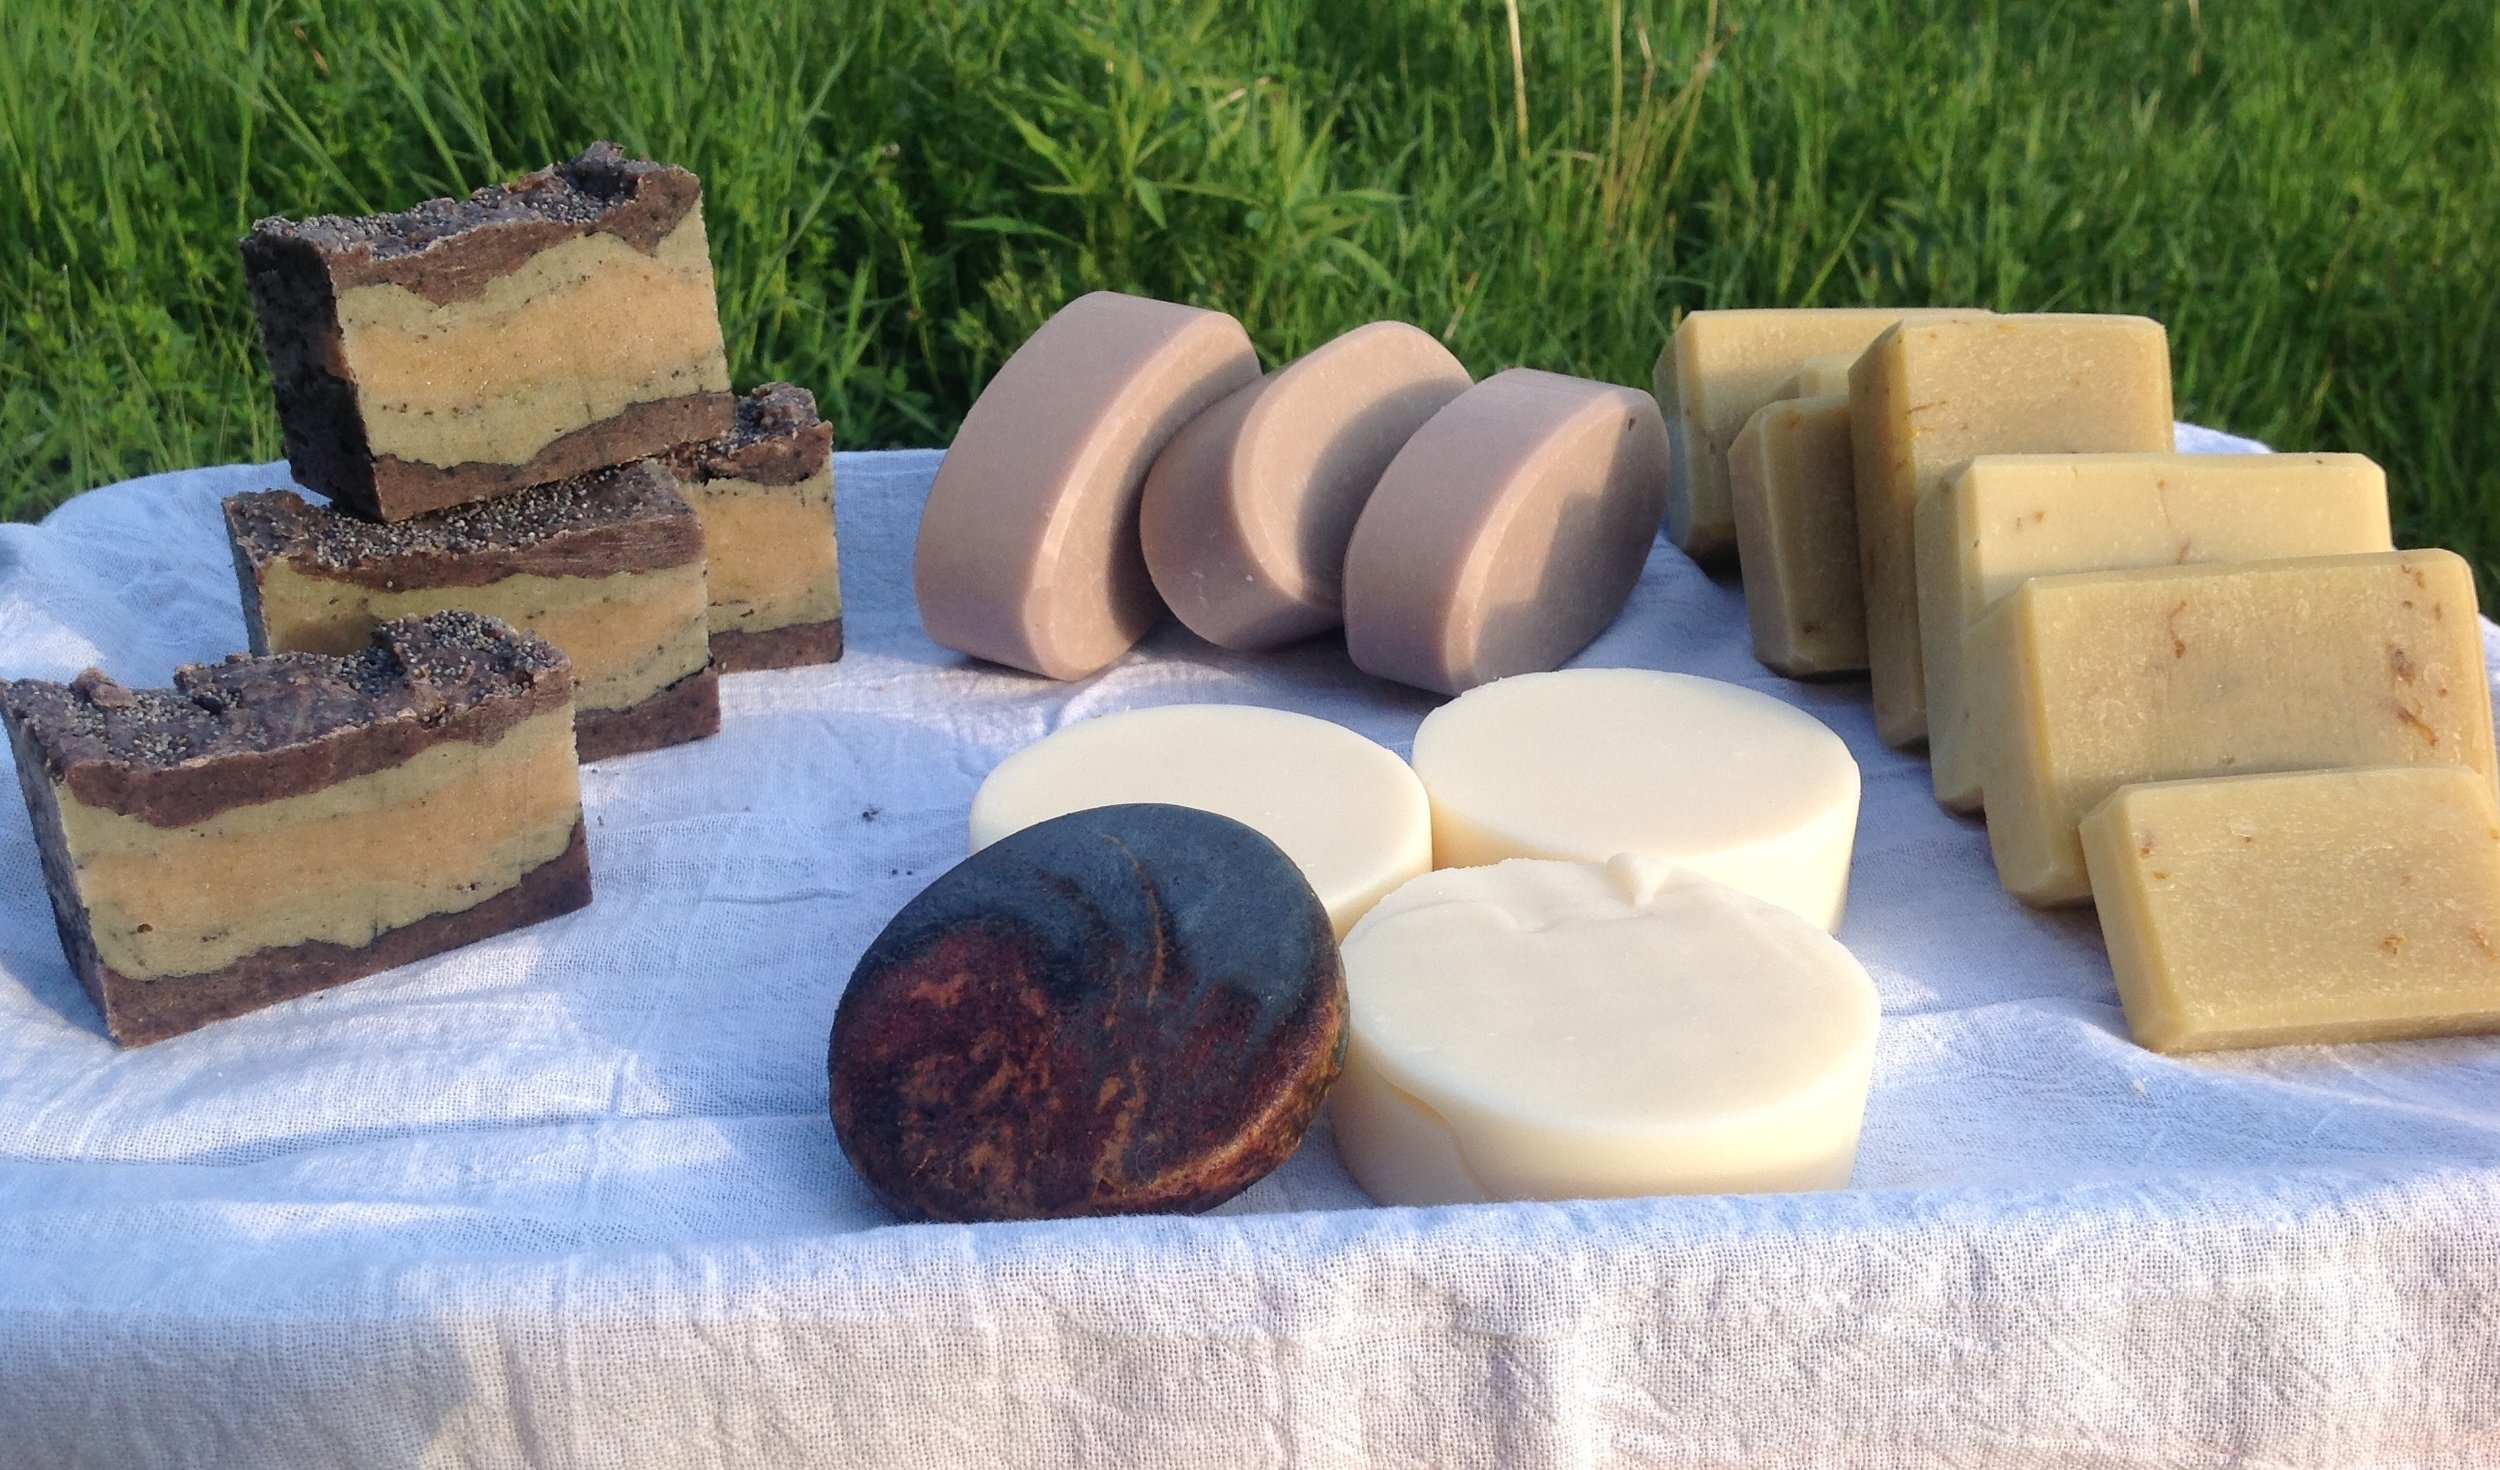 A small sampling of our all natural handmade soaps- left to right: rustic gardener, lavender (back), cedarwood lemongrass (front white), campfire soap (front dark), dandelion calendula bastille.